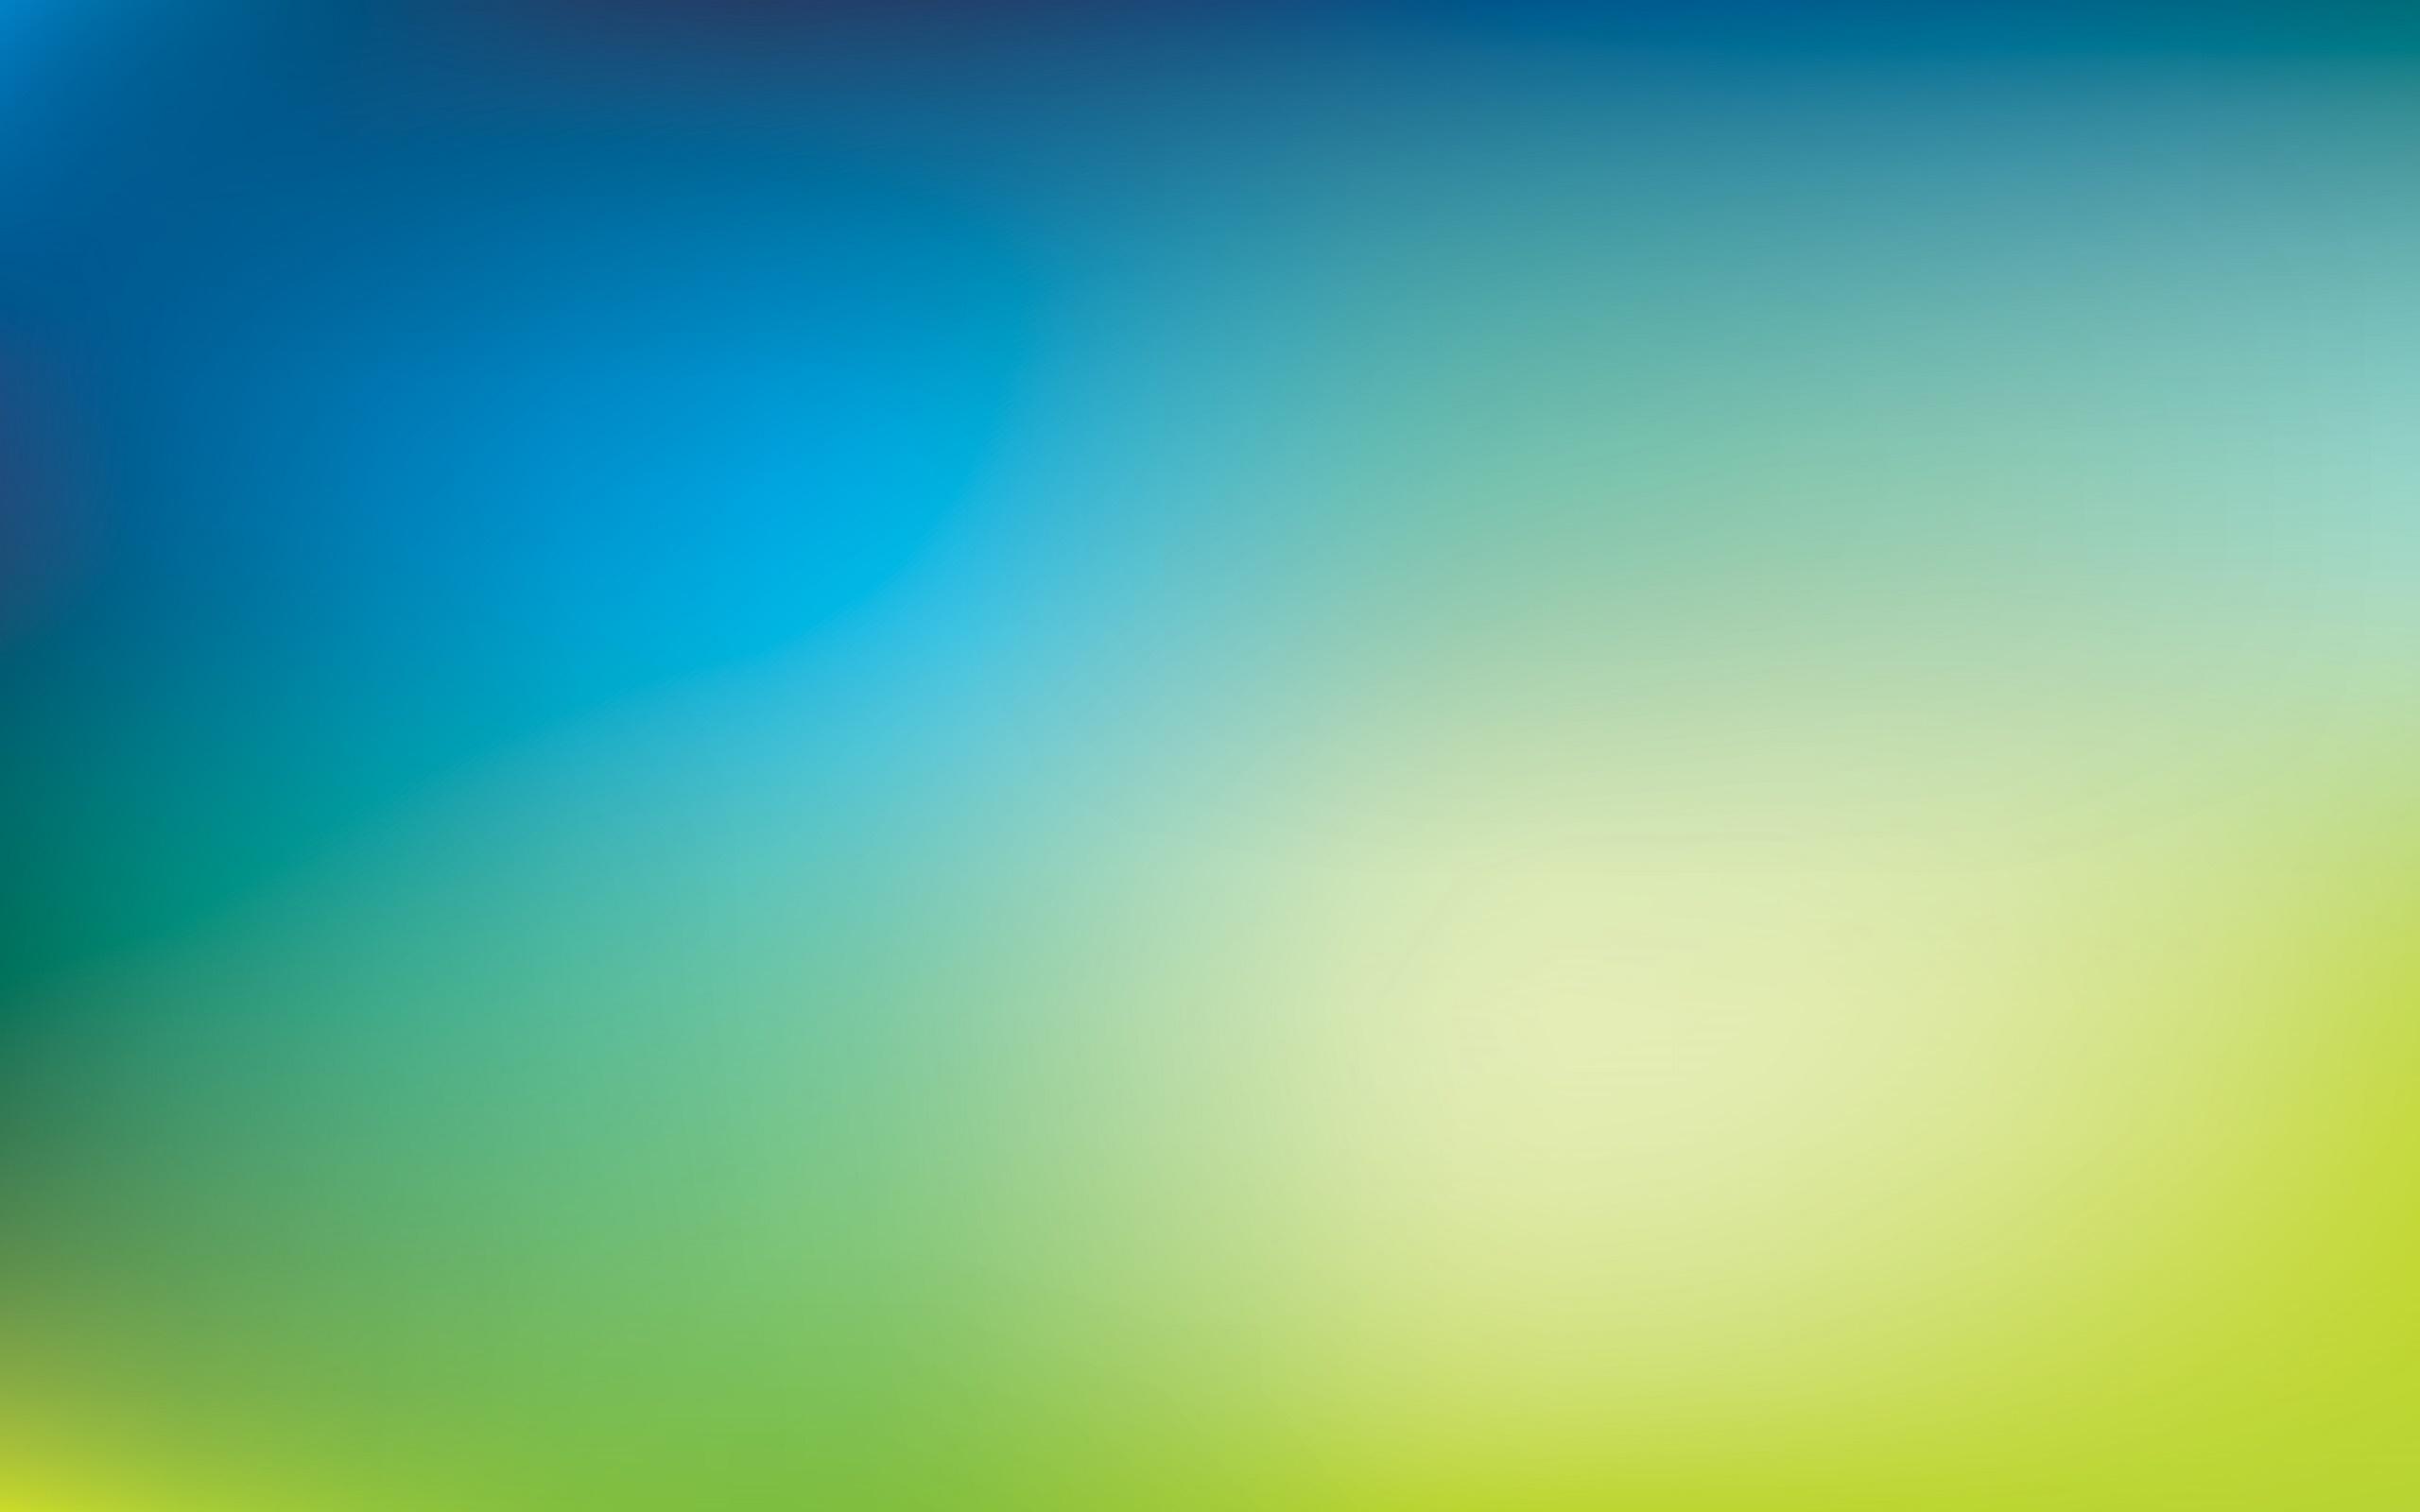 blur wallpaper hd iphone 6